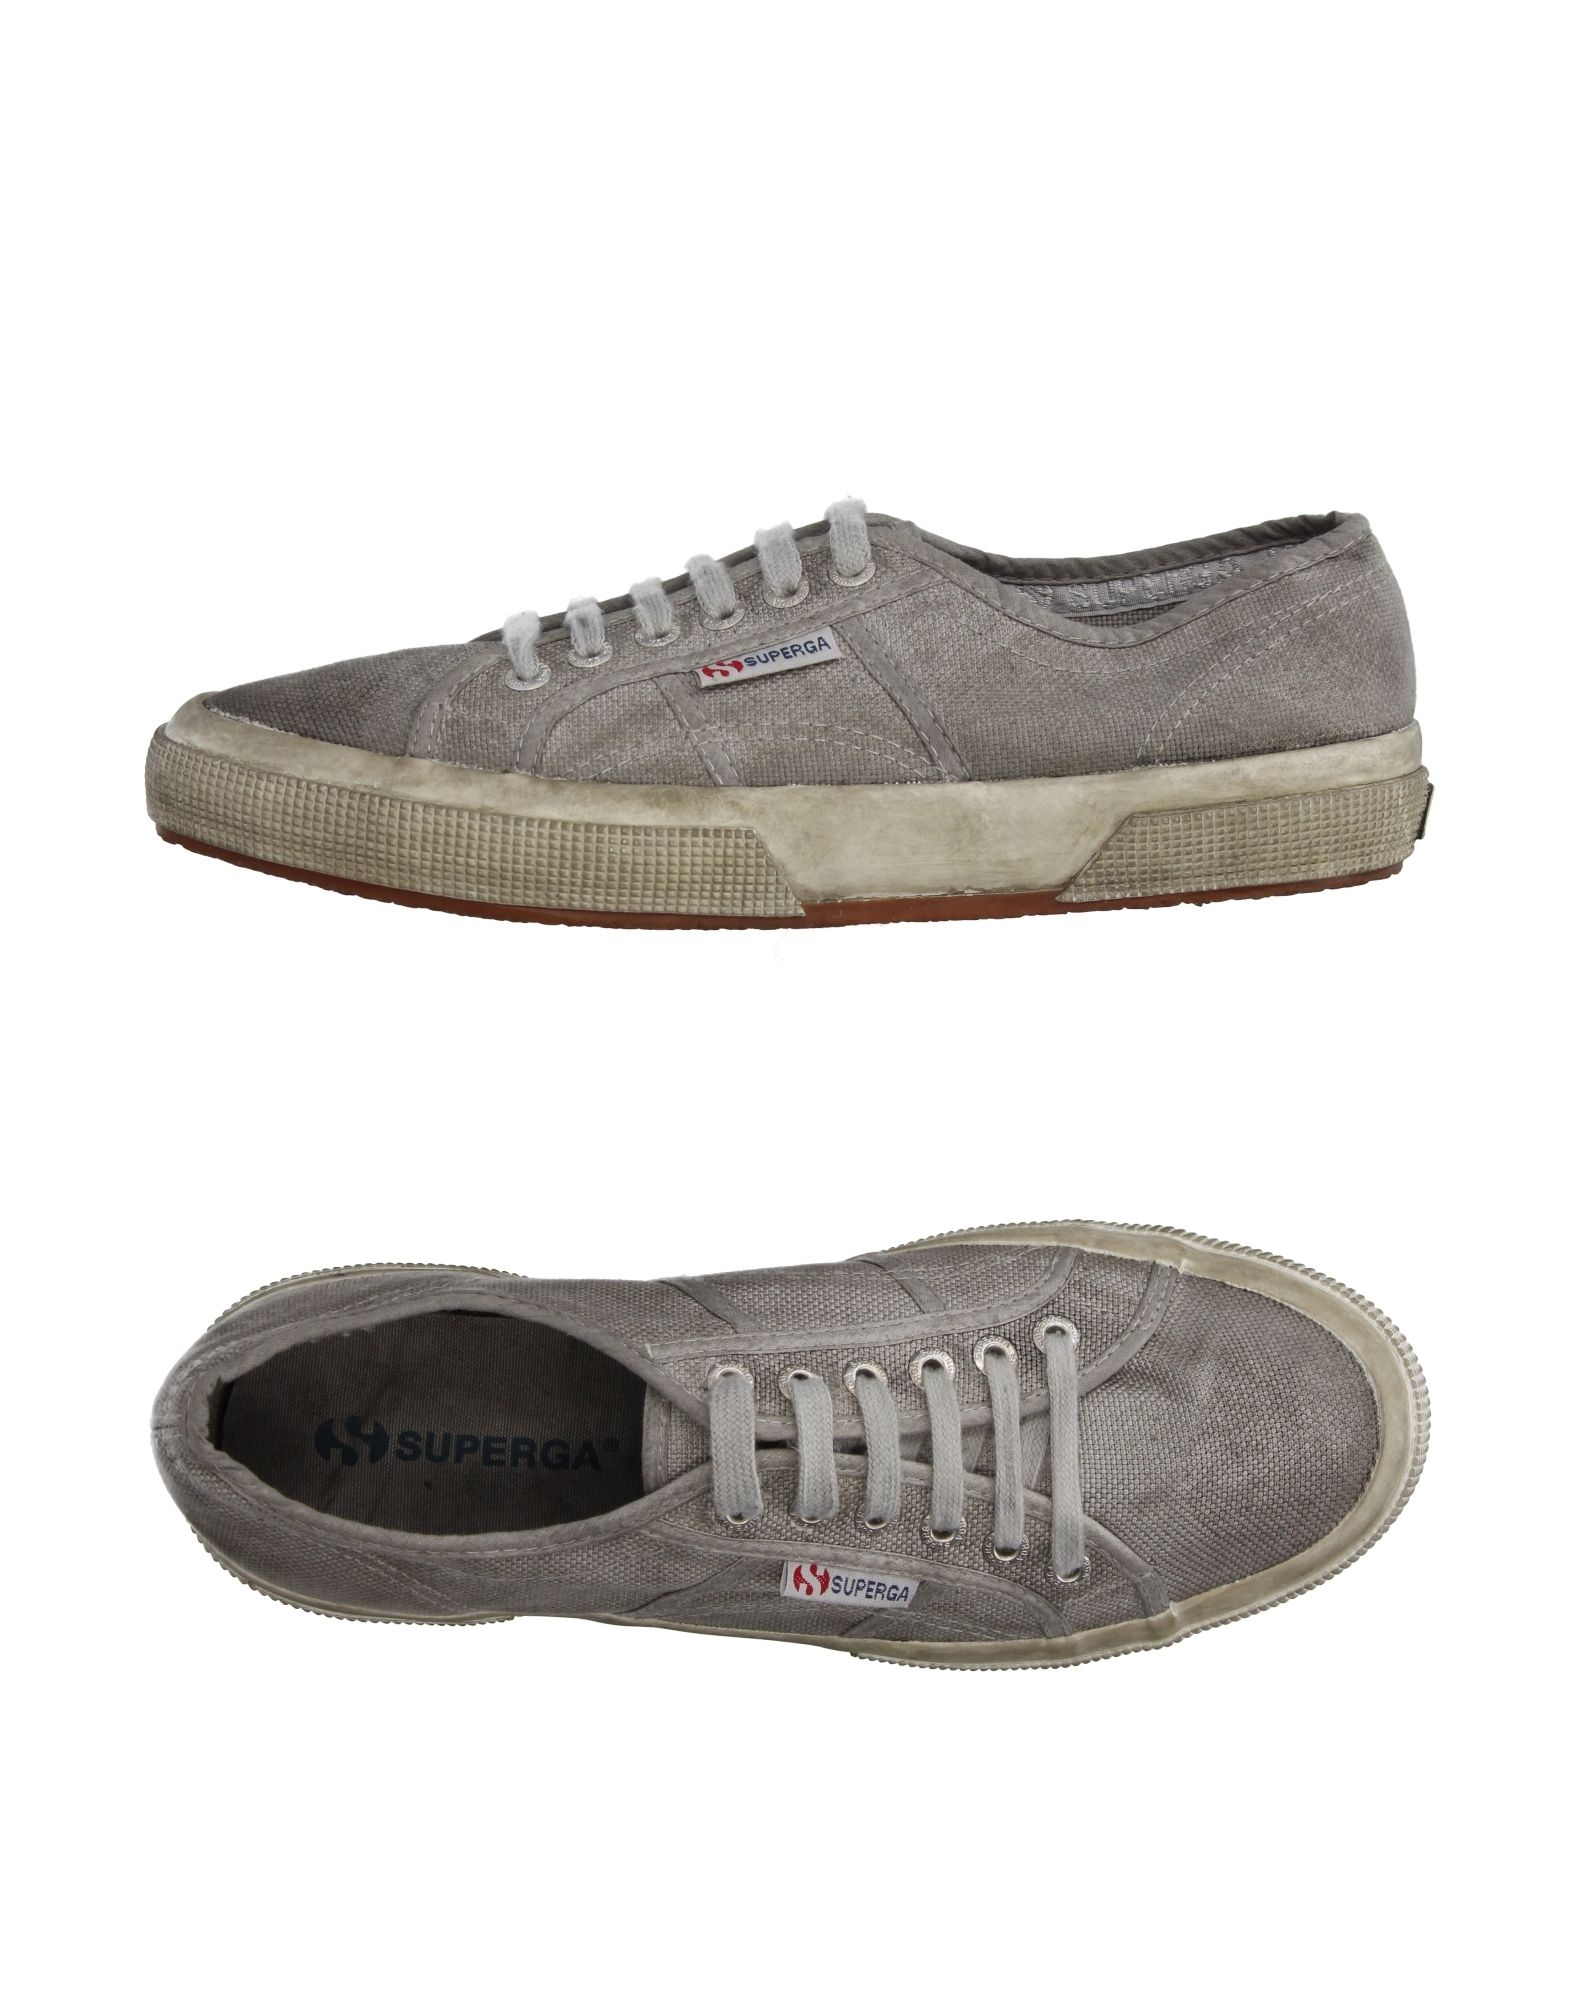 Superga® Sneakers Herren  11206194CW Heiße Schuhe